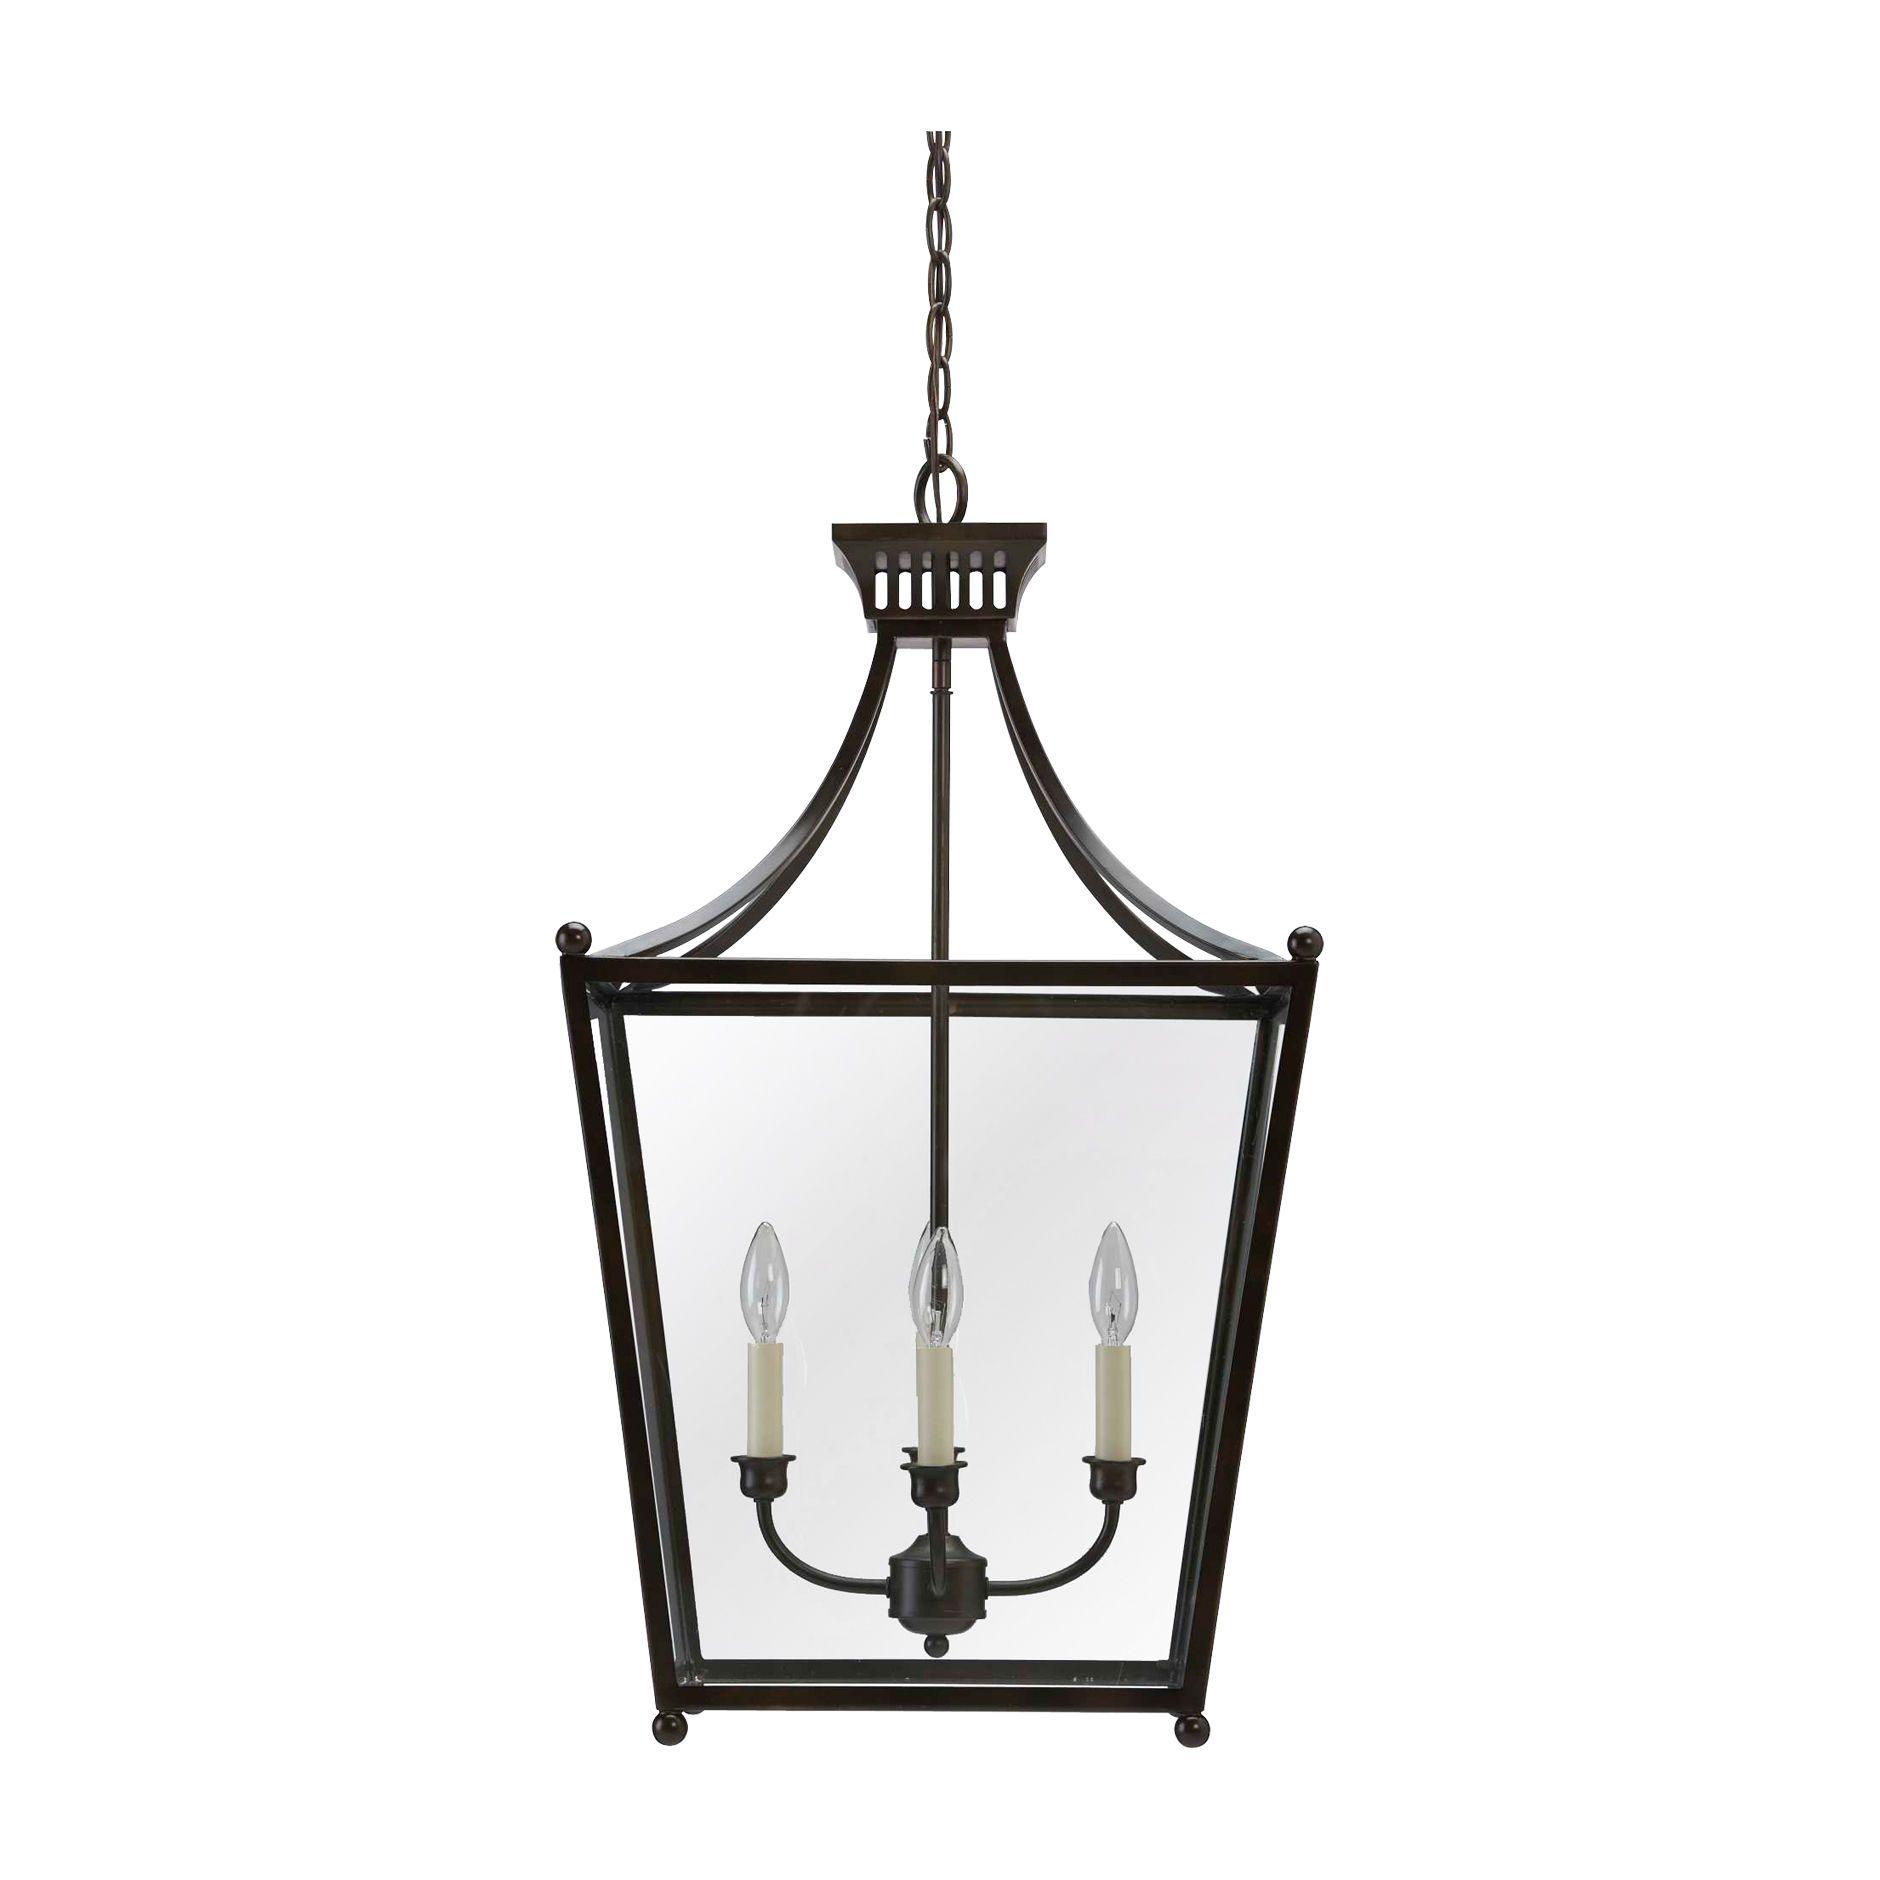 Stockton bronze lantern ethan allen us lighting pinterest stockton bronze lantern ethan allen us arubaitofo Image collections